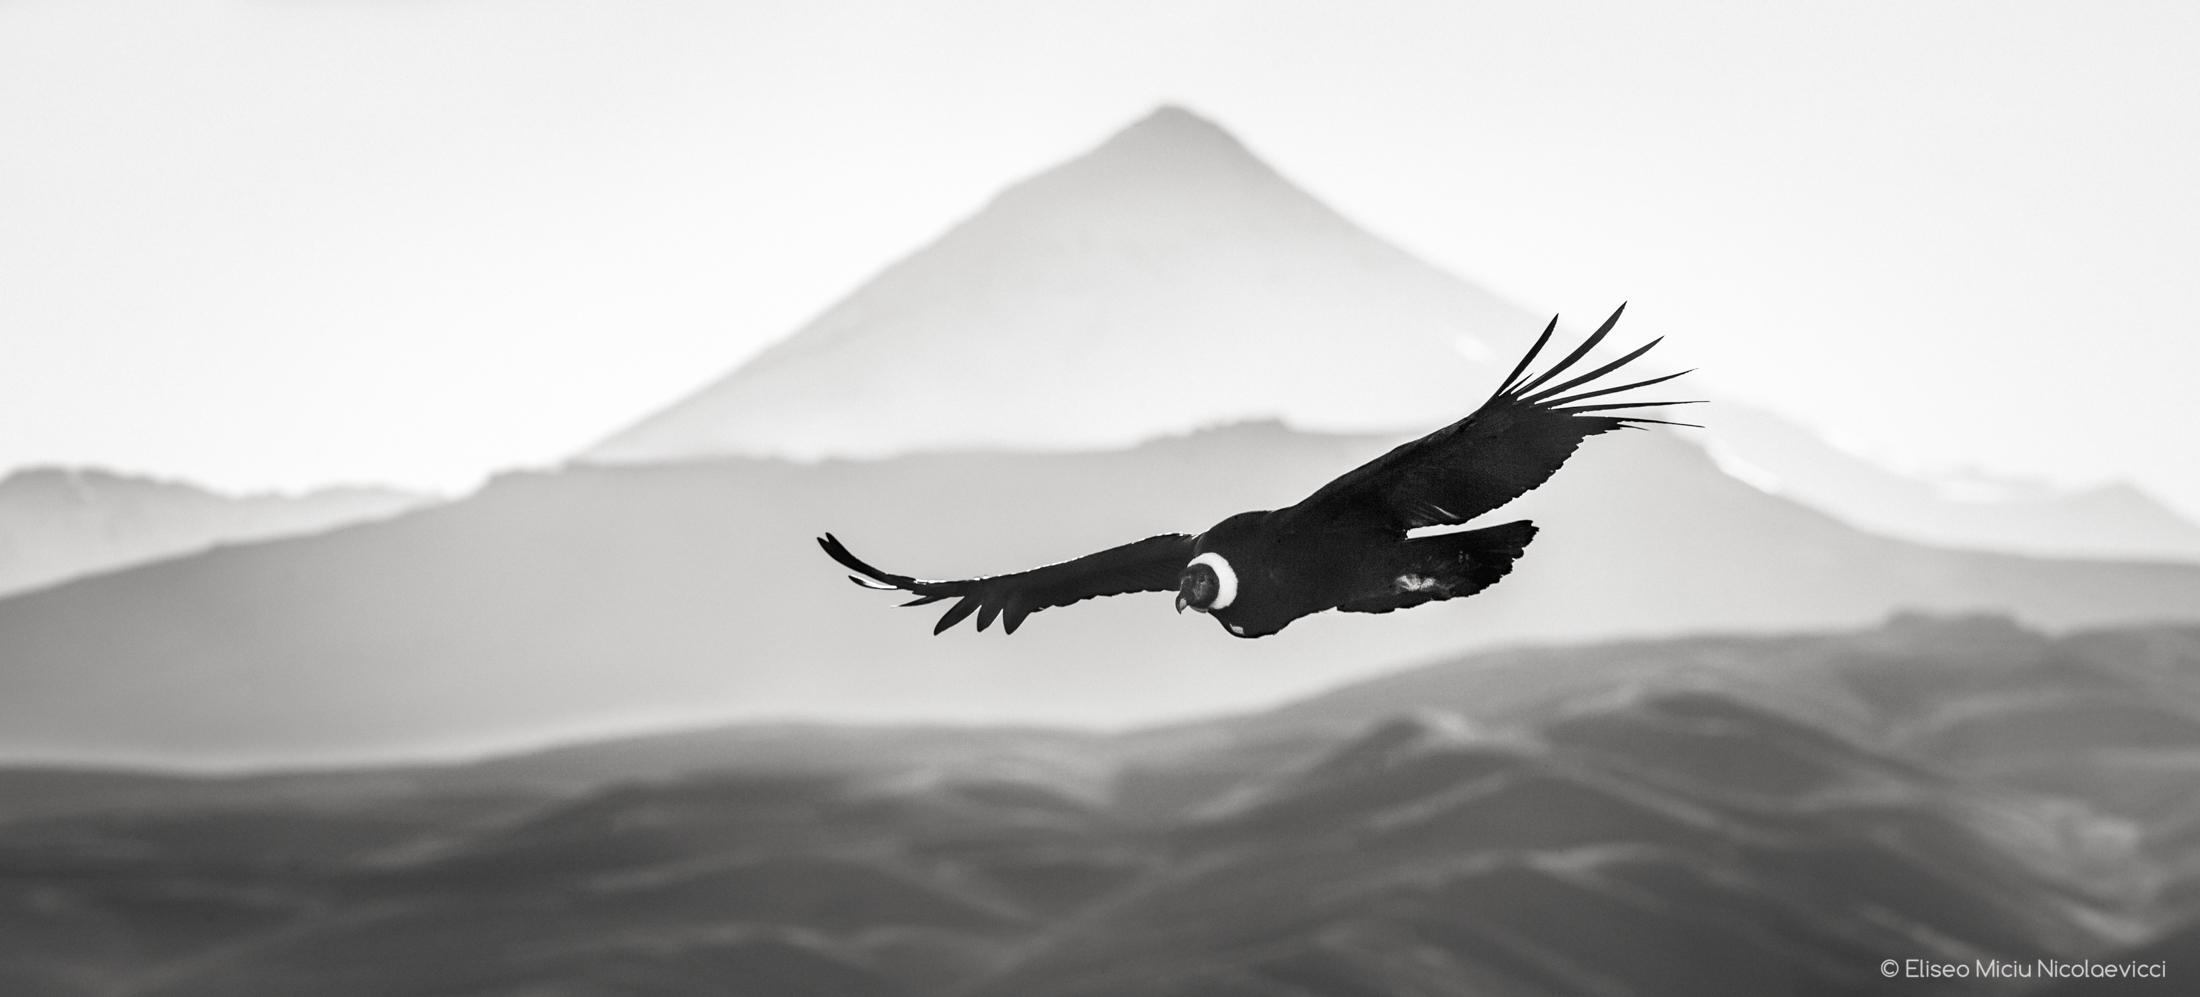 Emblema patagonico